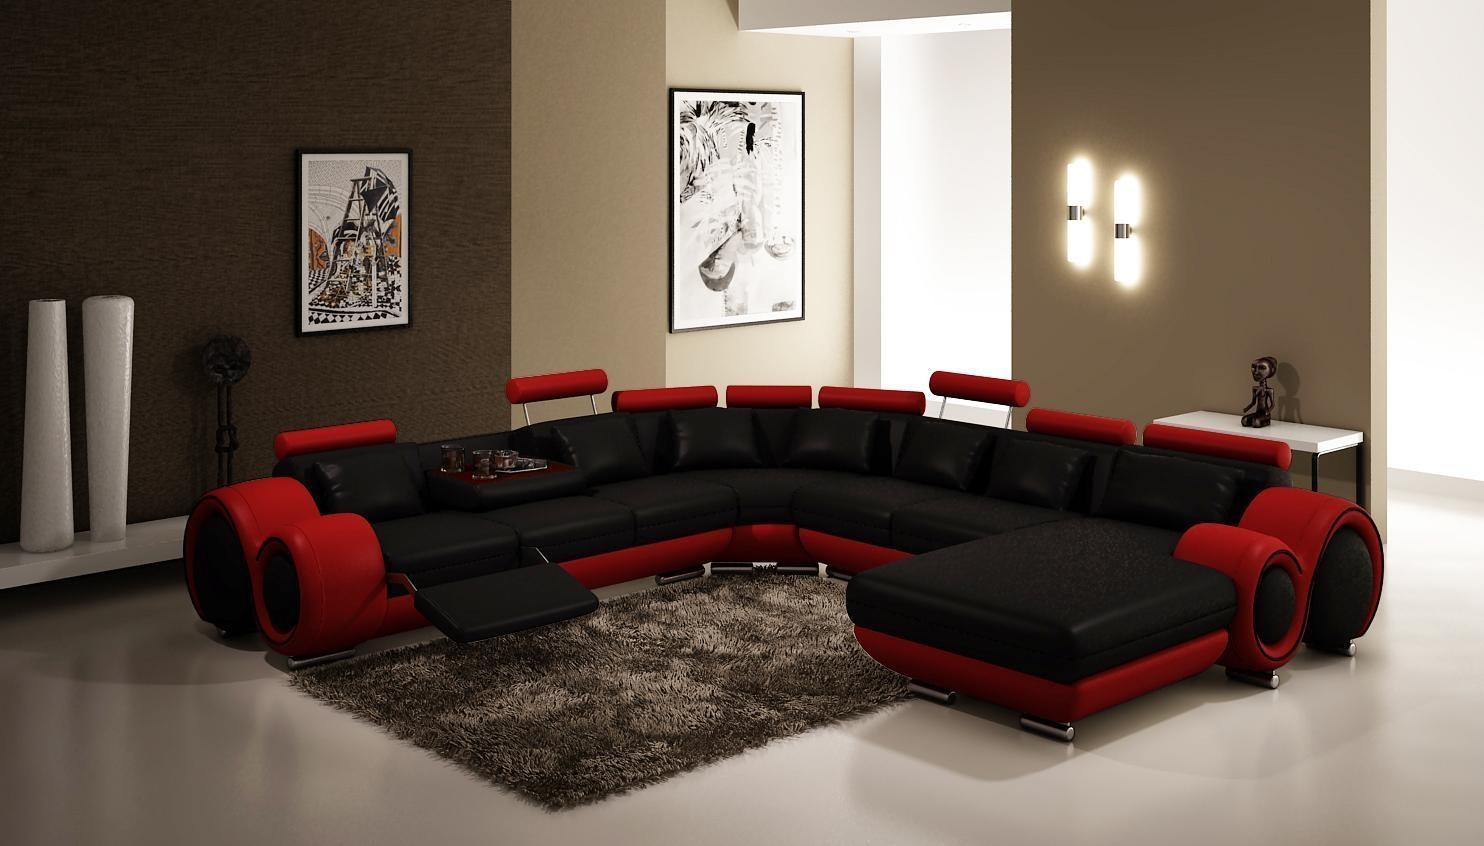 Modern Black And Red Sectional Sofa Set – Kenya For Black And Red Sofa Sets (Image 12 of 20)